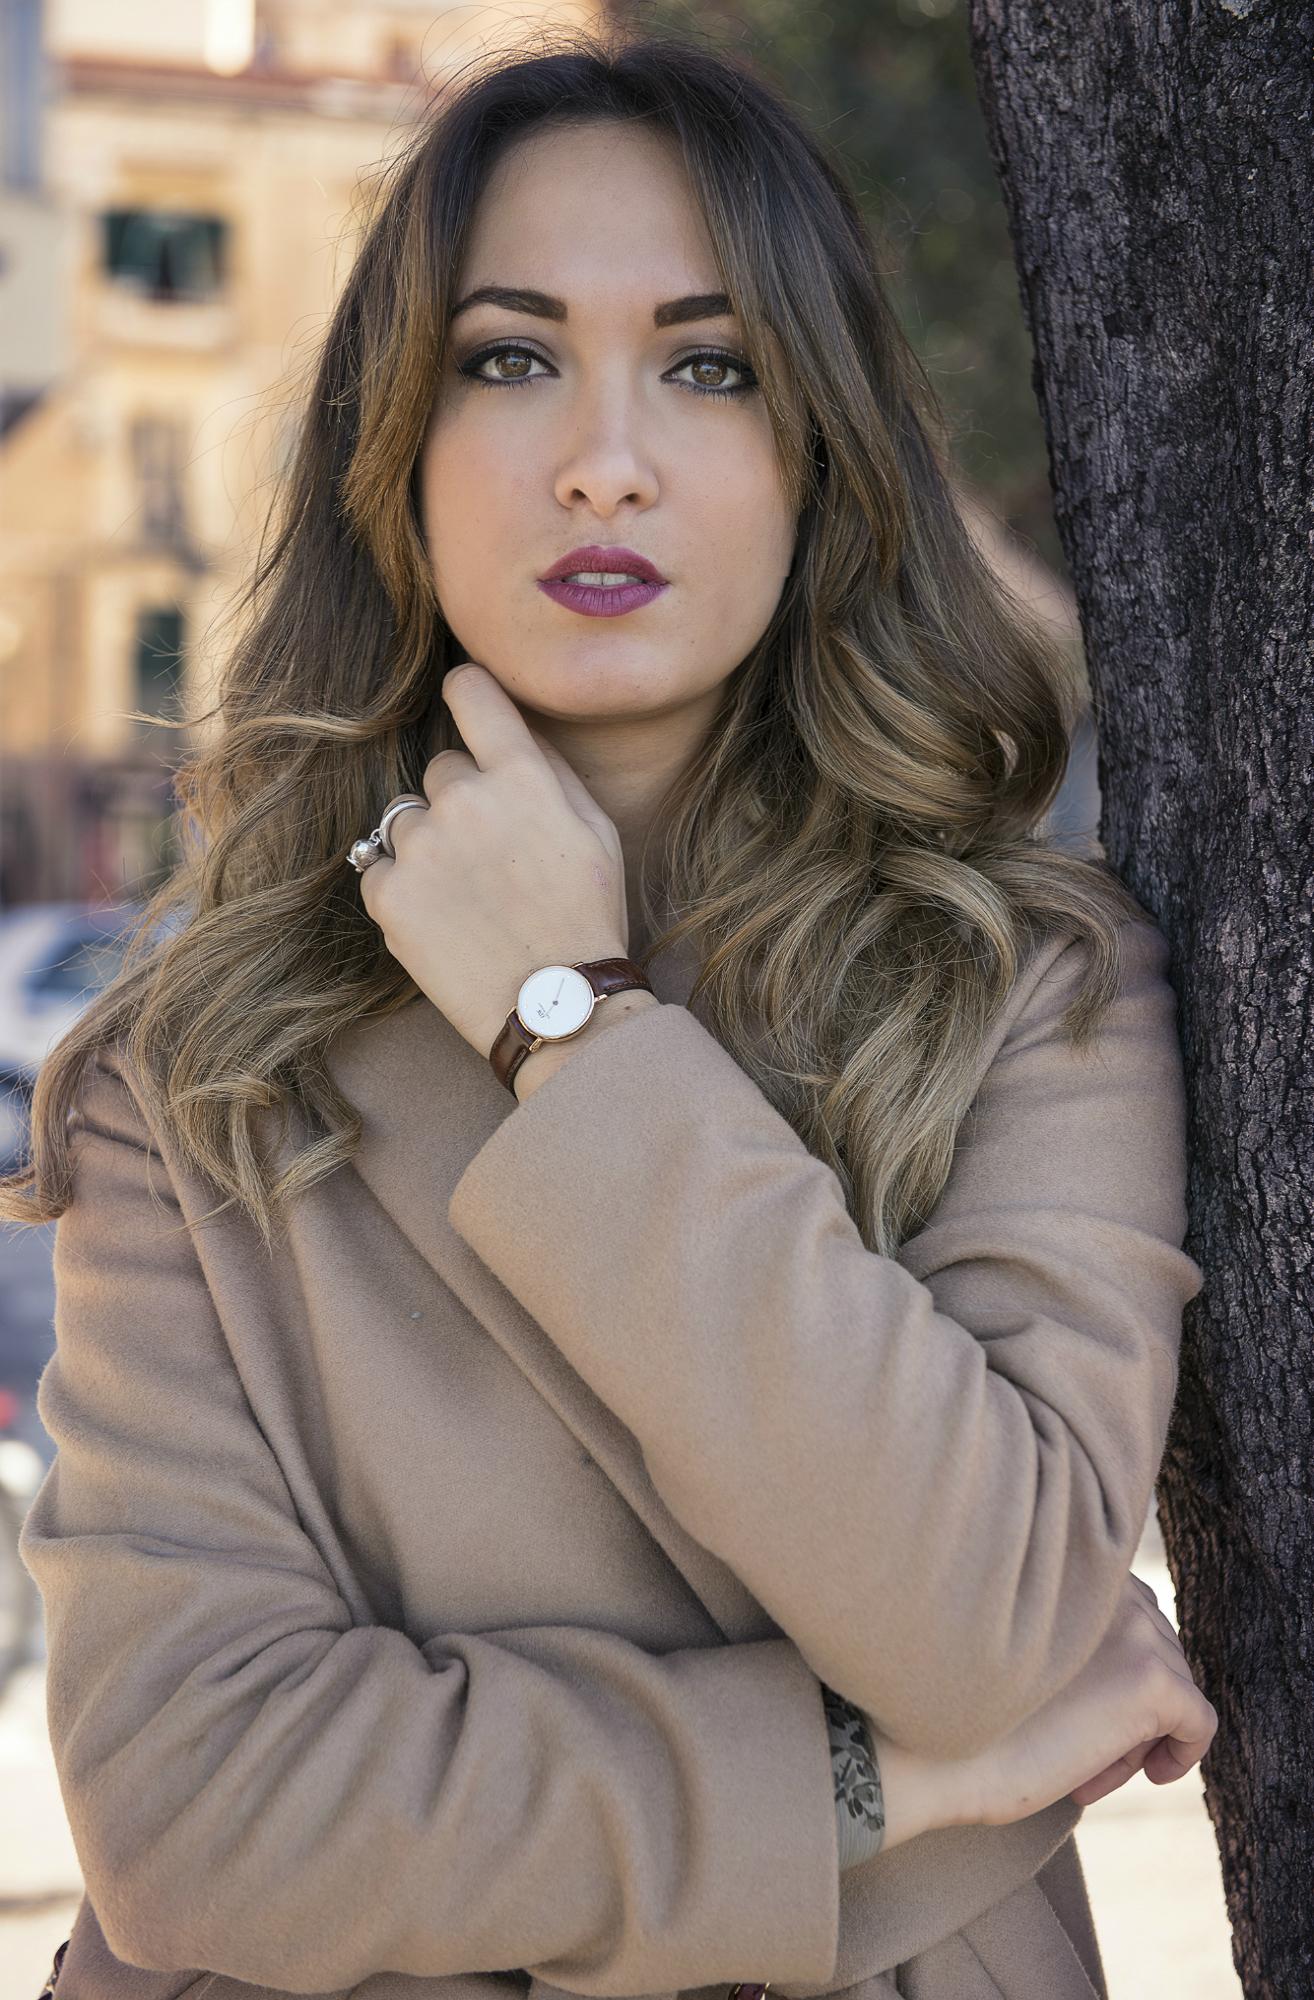 Maria giovanna abagnale, my glamour attitude, fashion blog, outfit, look, annie p, coat, cappotto, camel, trend, winter, 2015, mia bag, lorenzo pandarolo ph